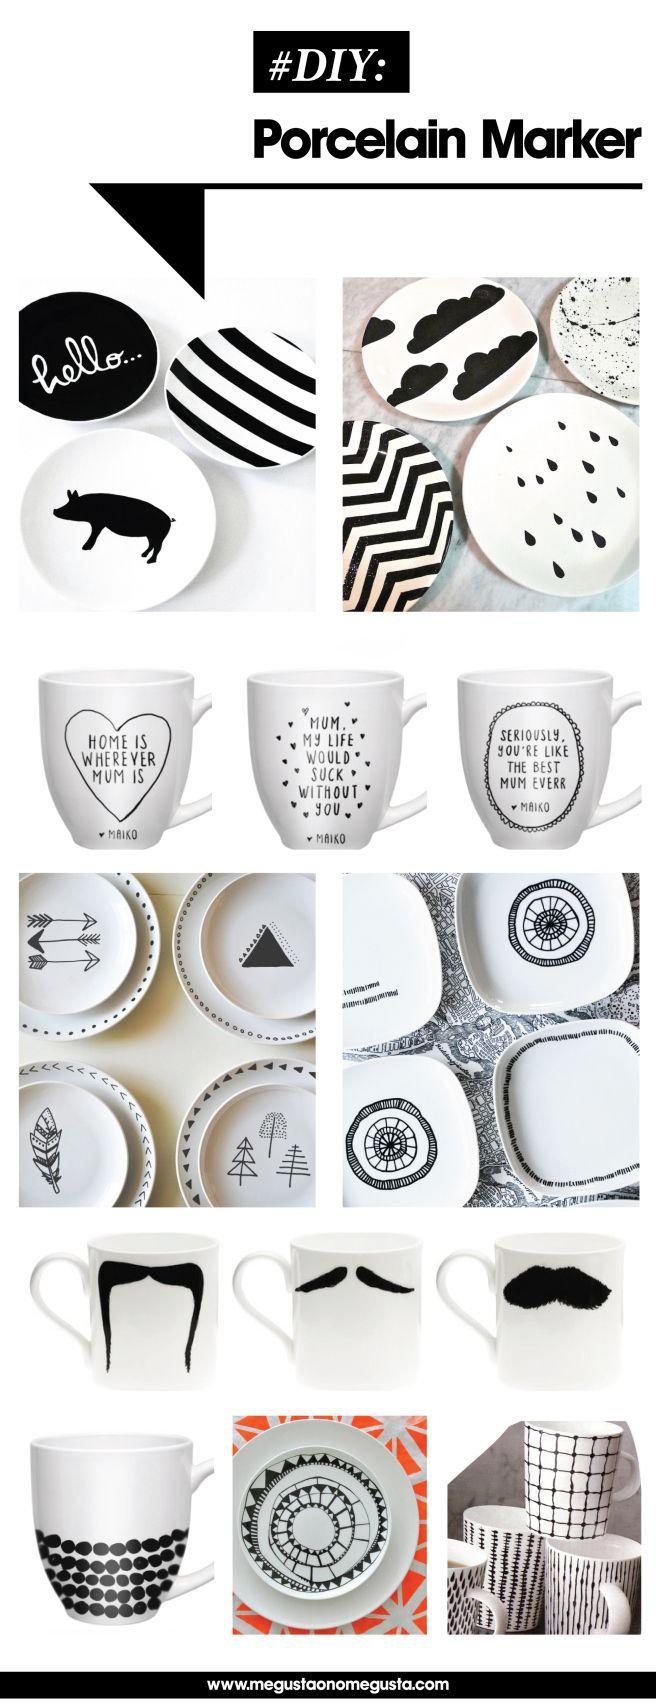 Best DIY Porcelain Marker Craft Ideas!